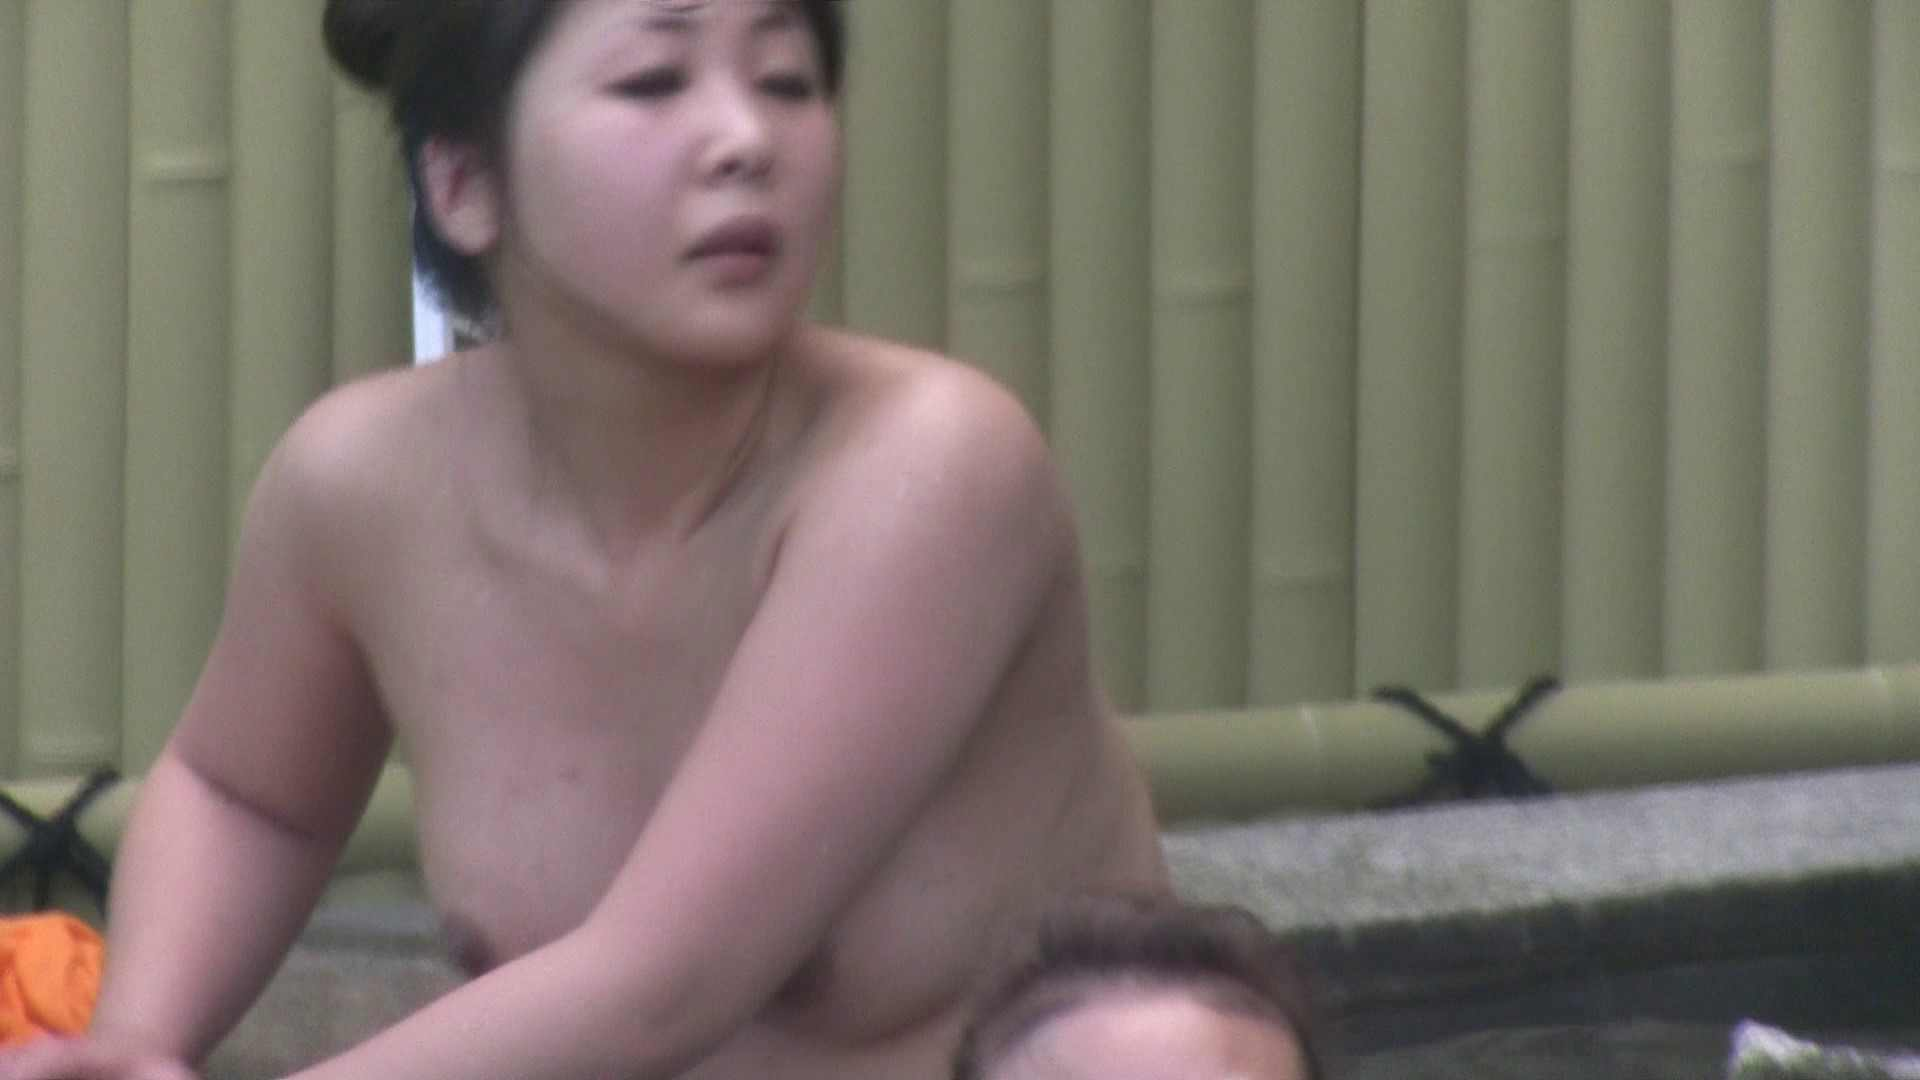 Aquaな露天風呂Vol.118 OL女体  68連発 57